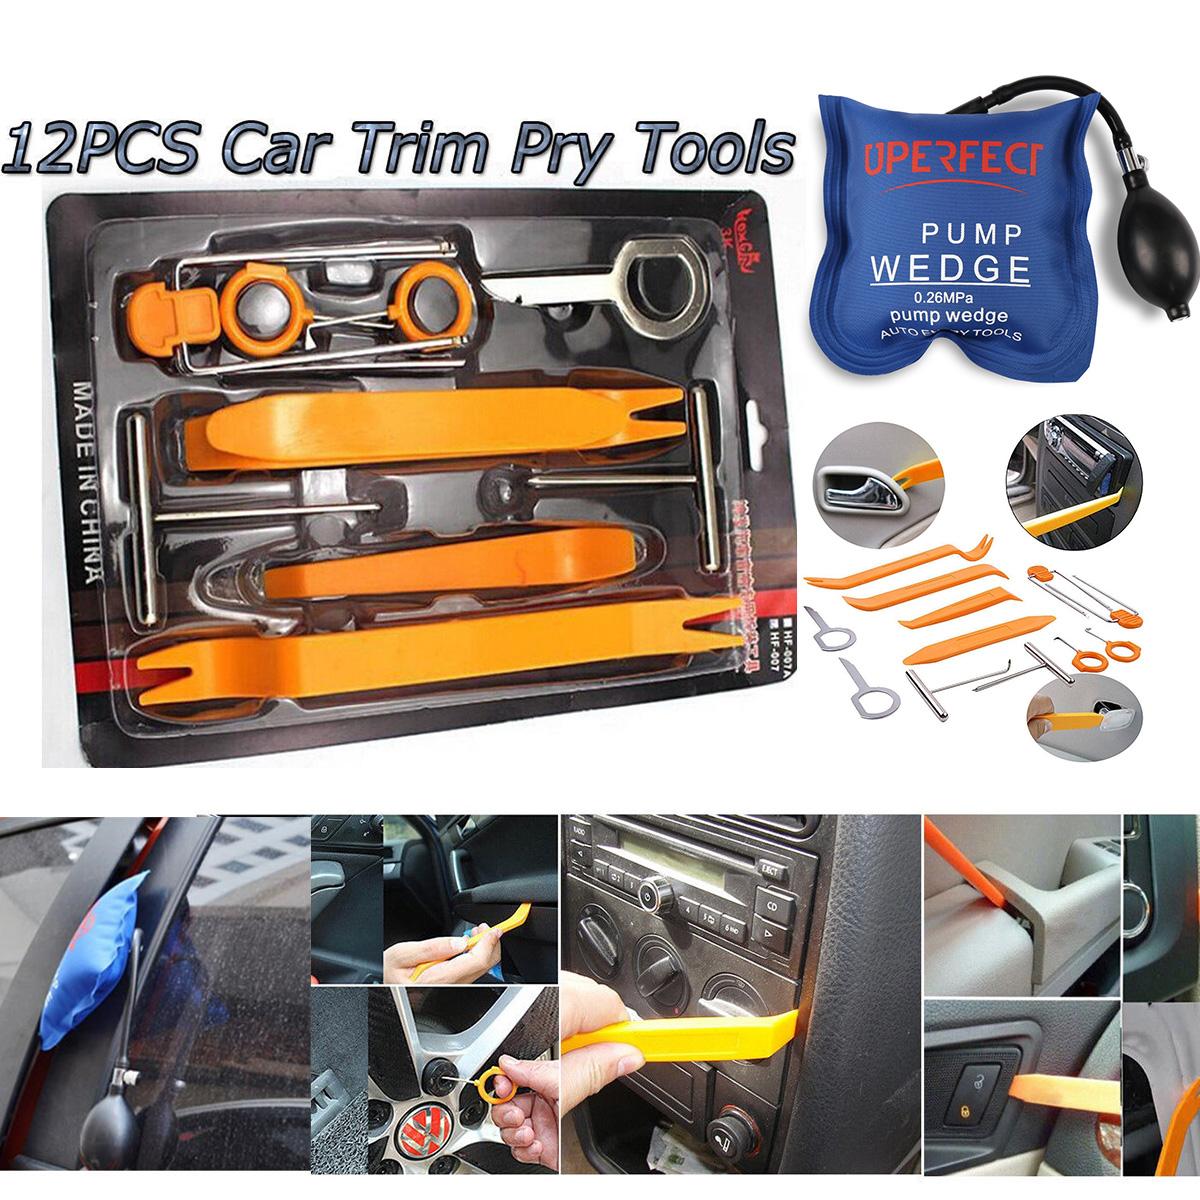 12pcs Car Panel Removal Open Pry Tools Kit Dash Door Radio Trim Pump Wedge hr